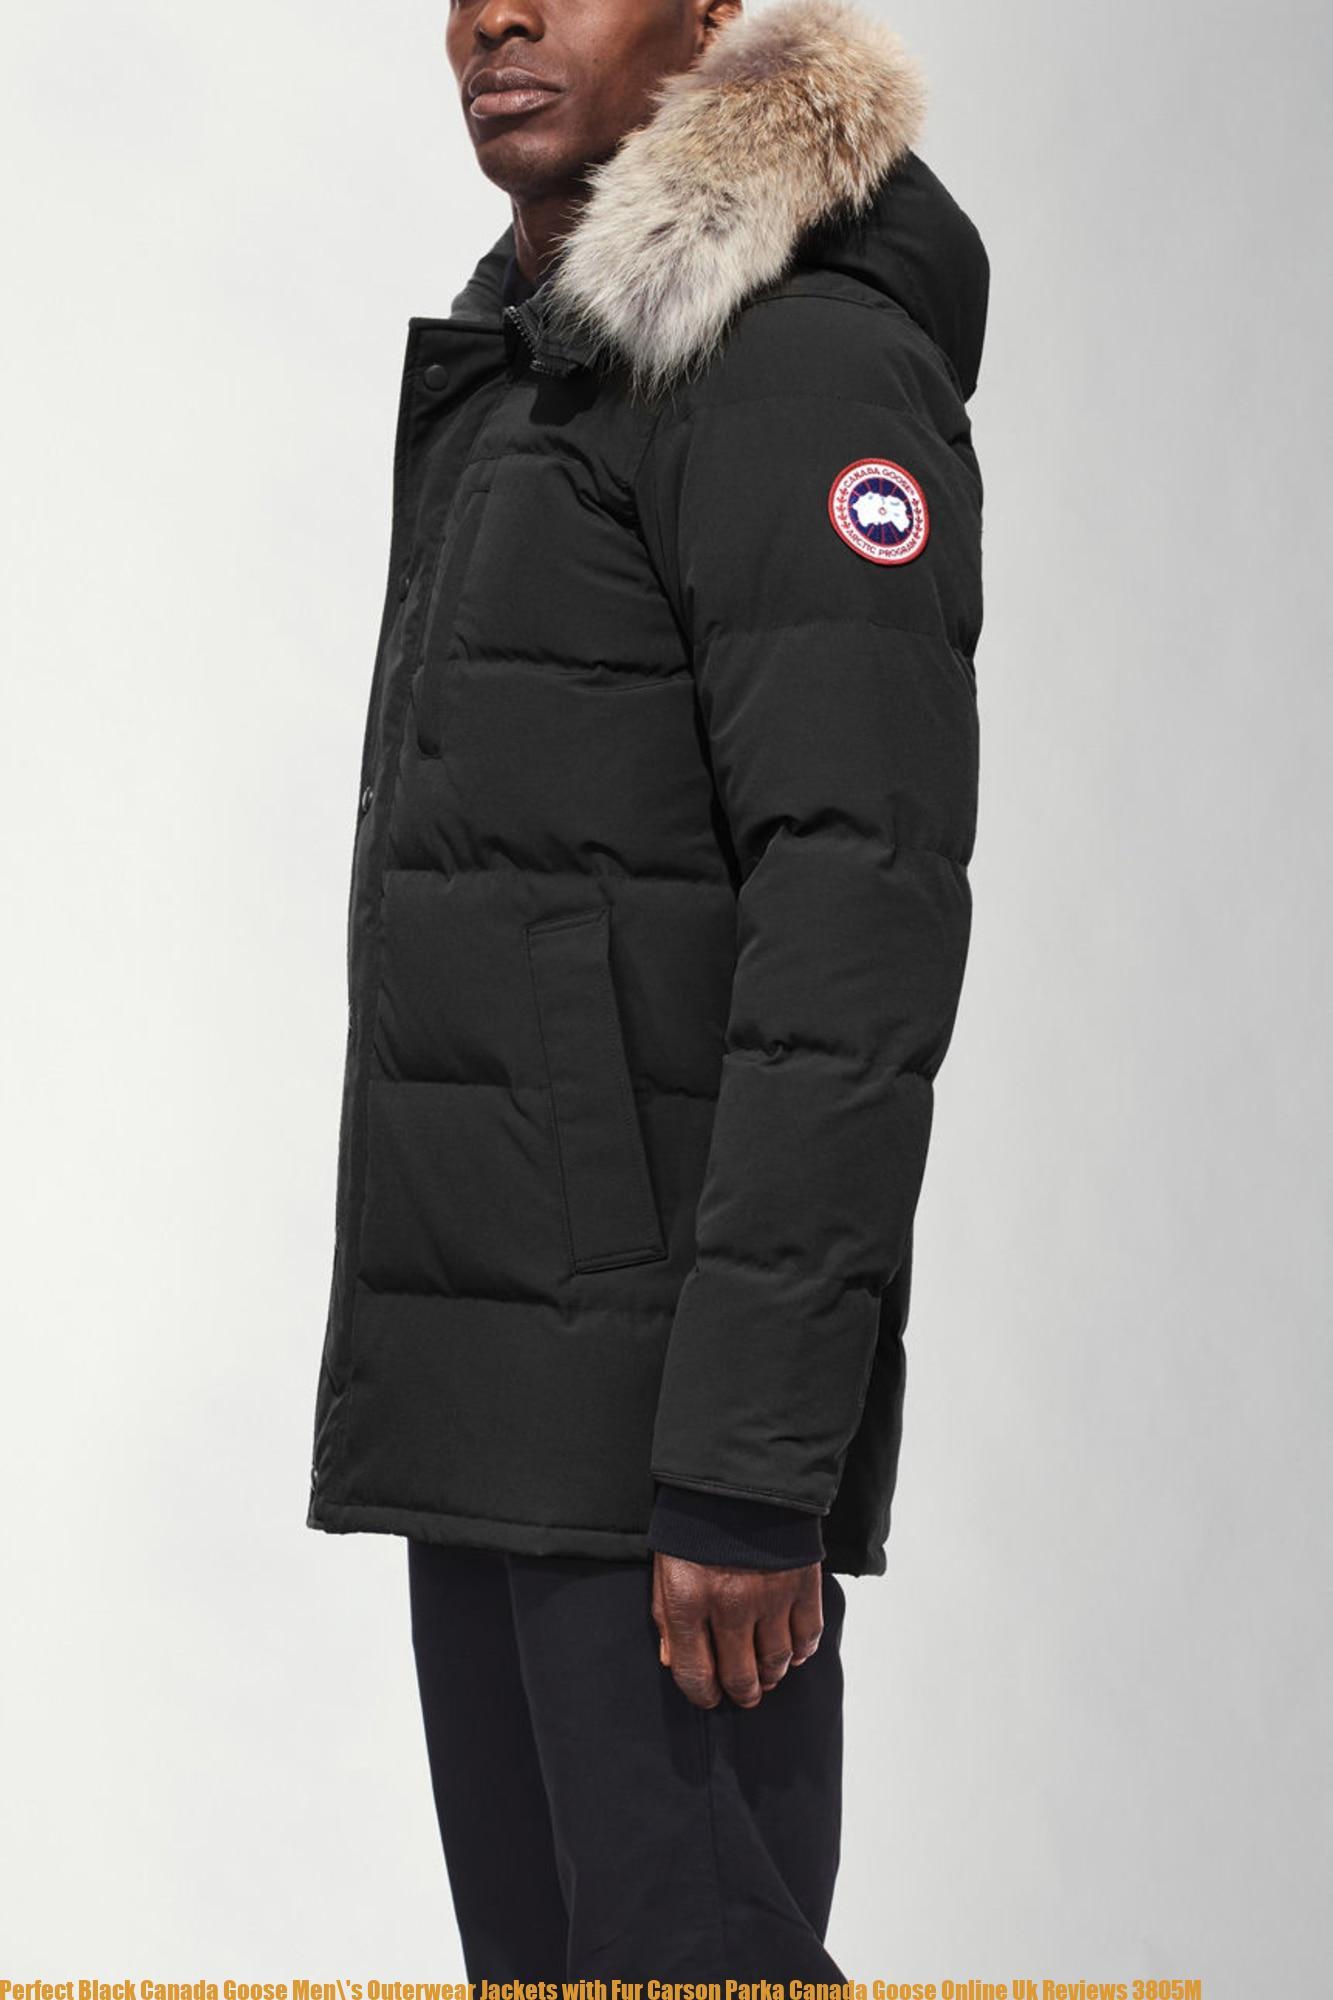 839c21d0933 Perfect Black Canada Goose Men\'s Outerwear Jackets with Fur Carson Parka  Canada Goose Online Uk Reviews 3805M